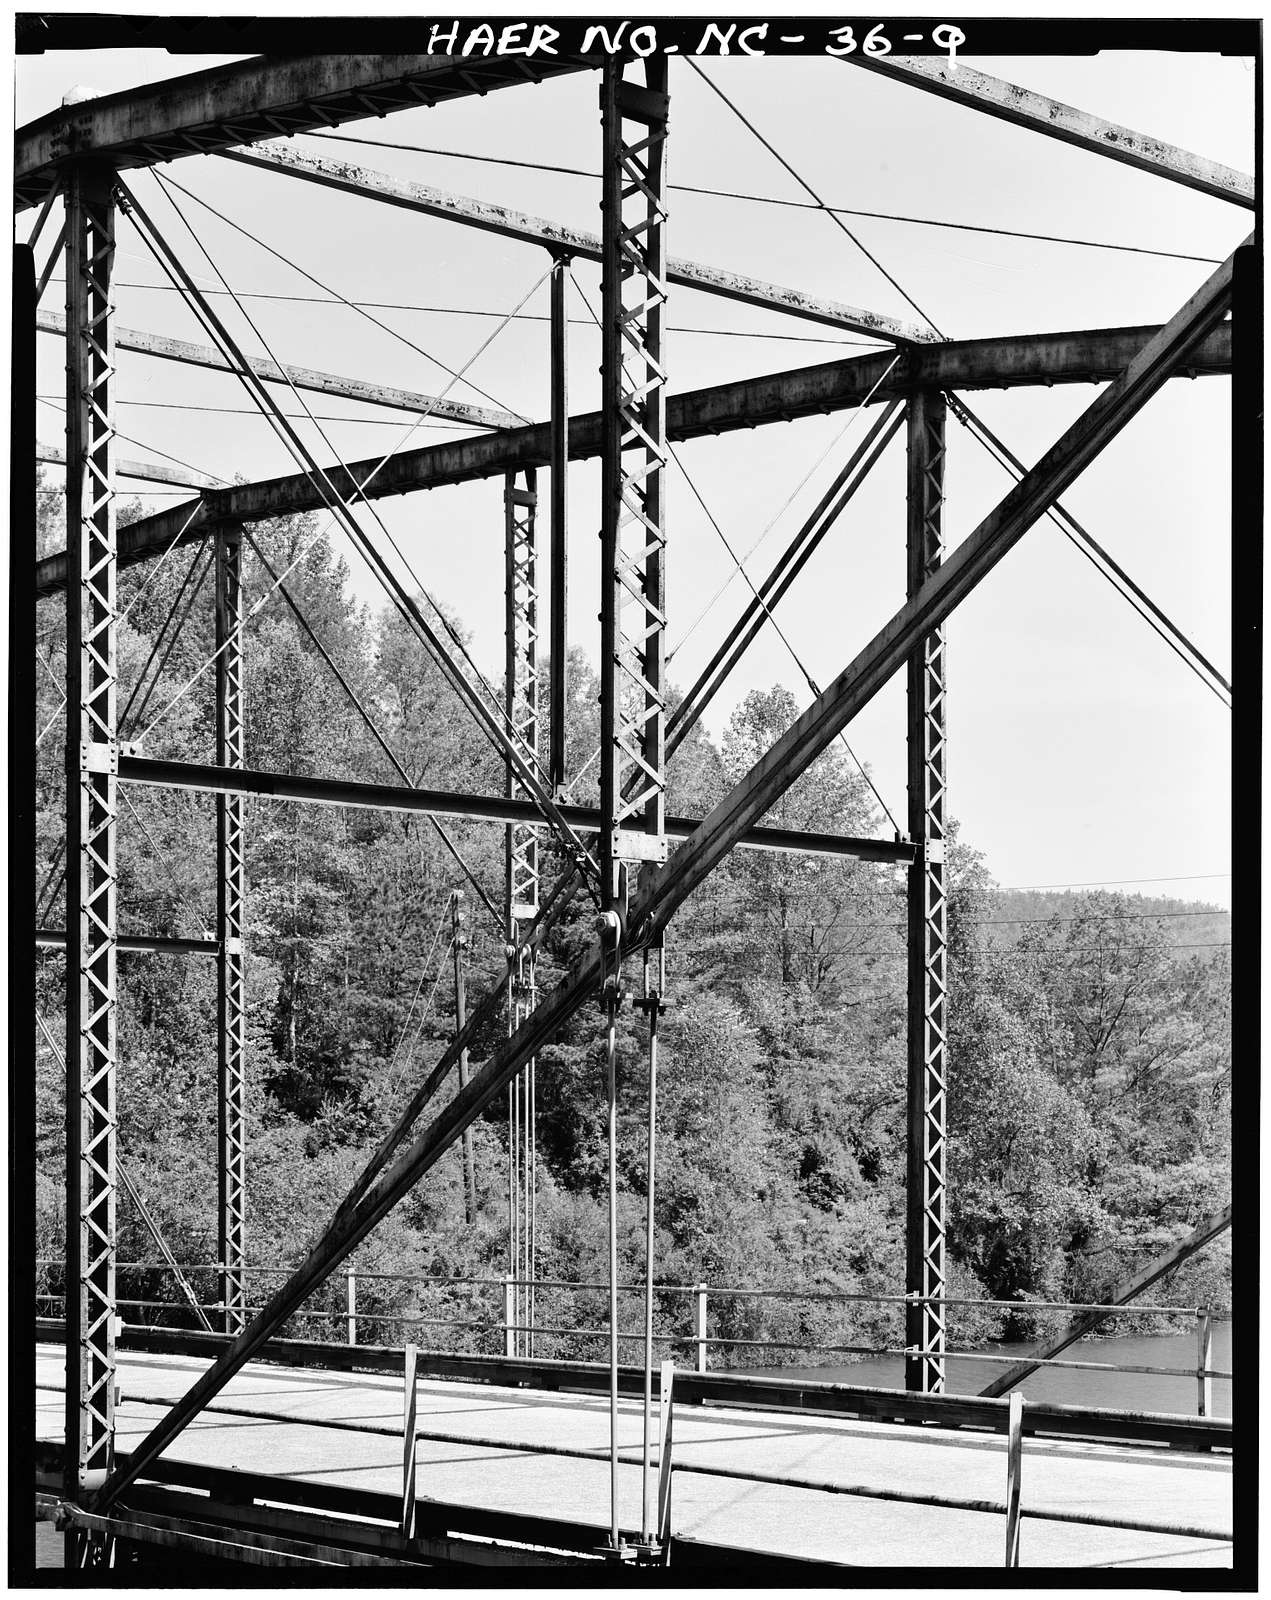 North Carolina Route 1852 Bridge, Spanning Lake Summit, Tuxedo, Henderson County, NC